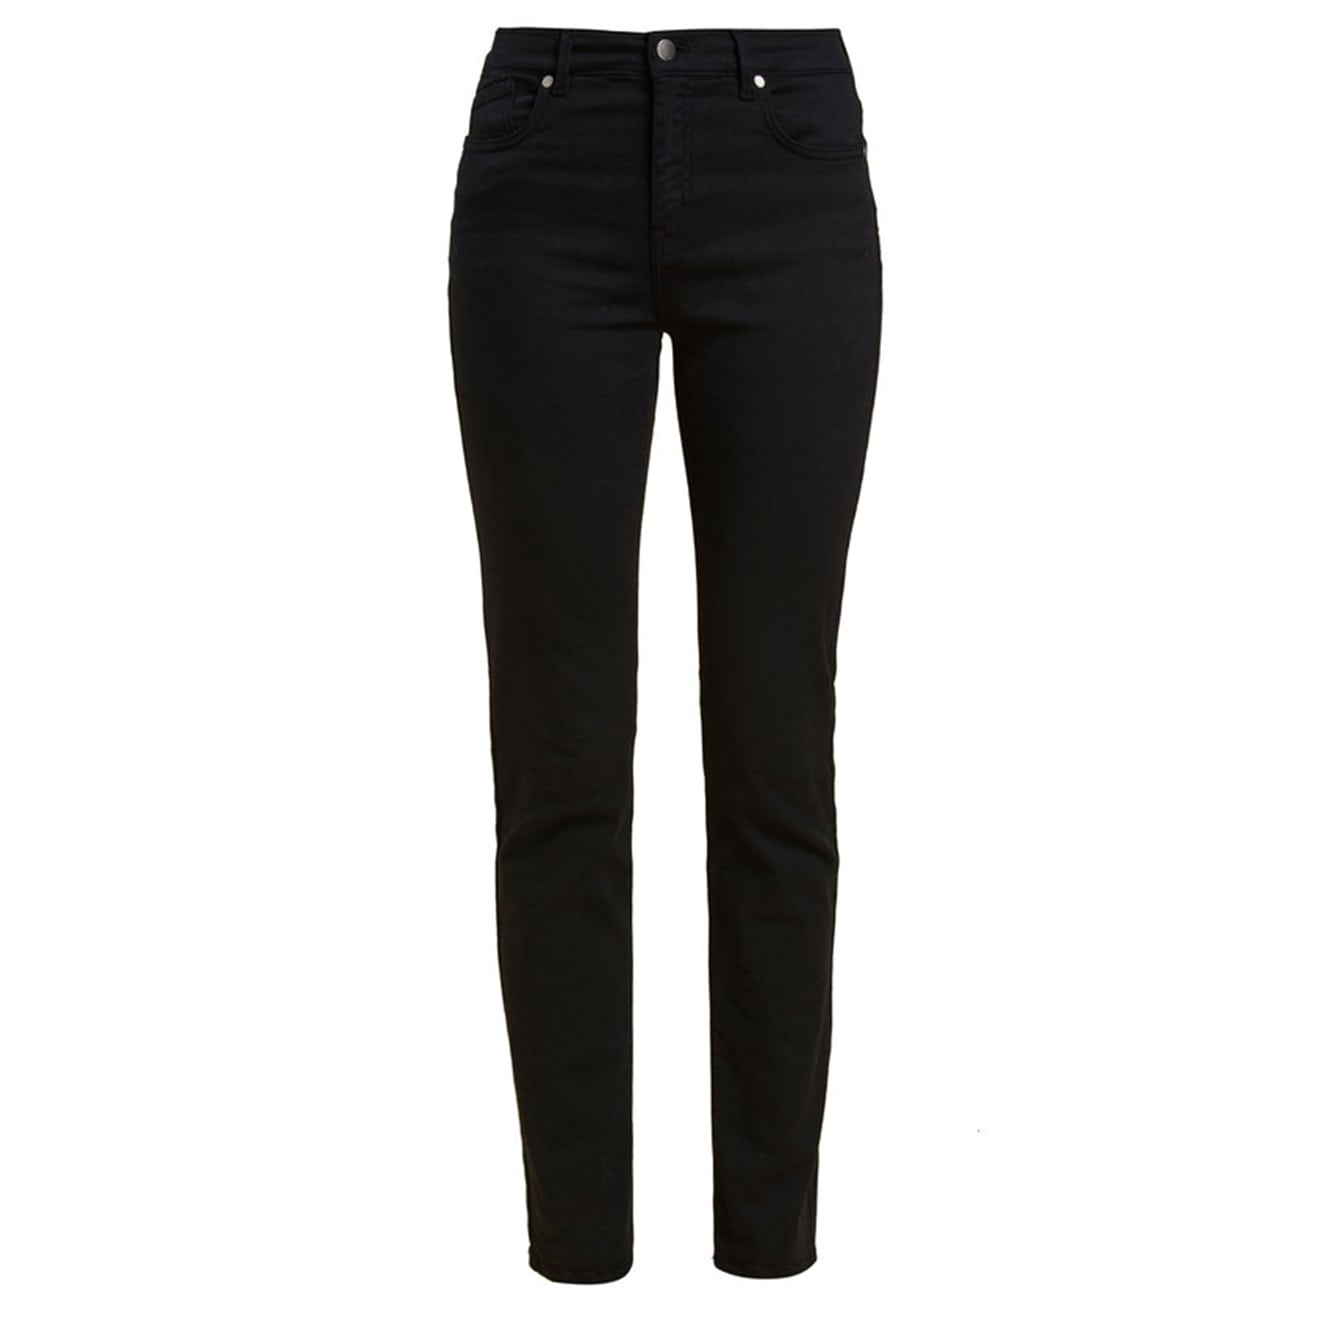 Barbour Womens Essential Slim Trousers Black